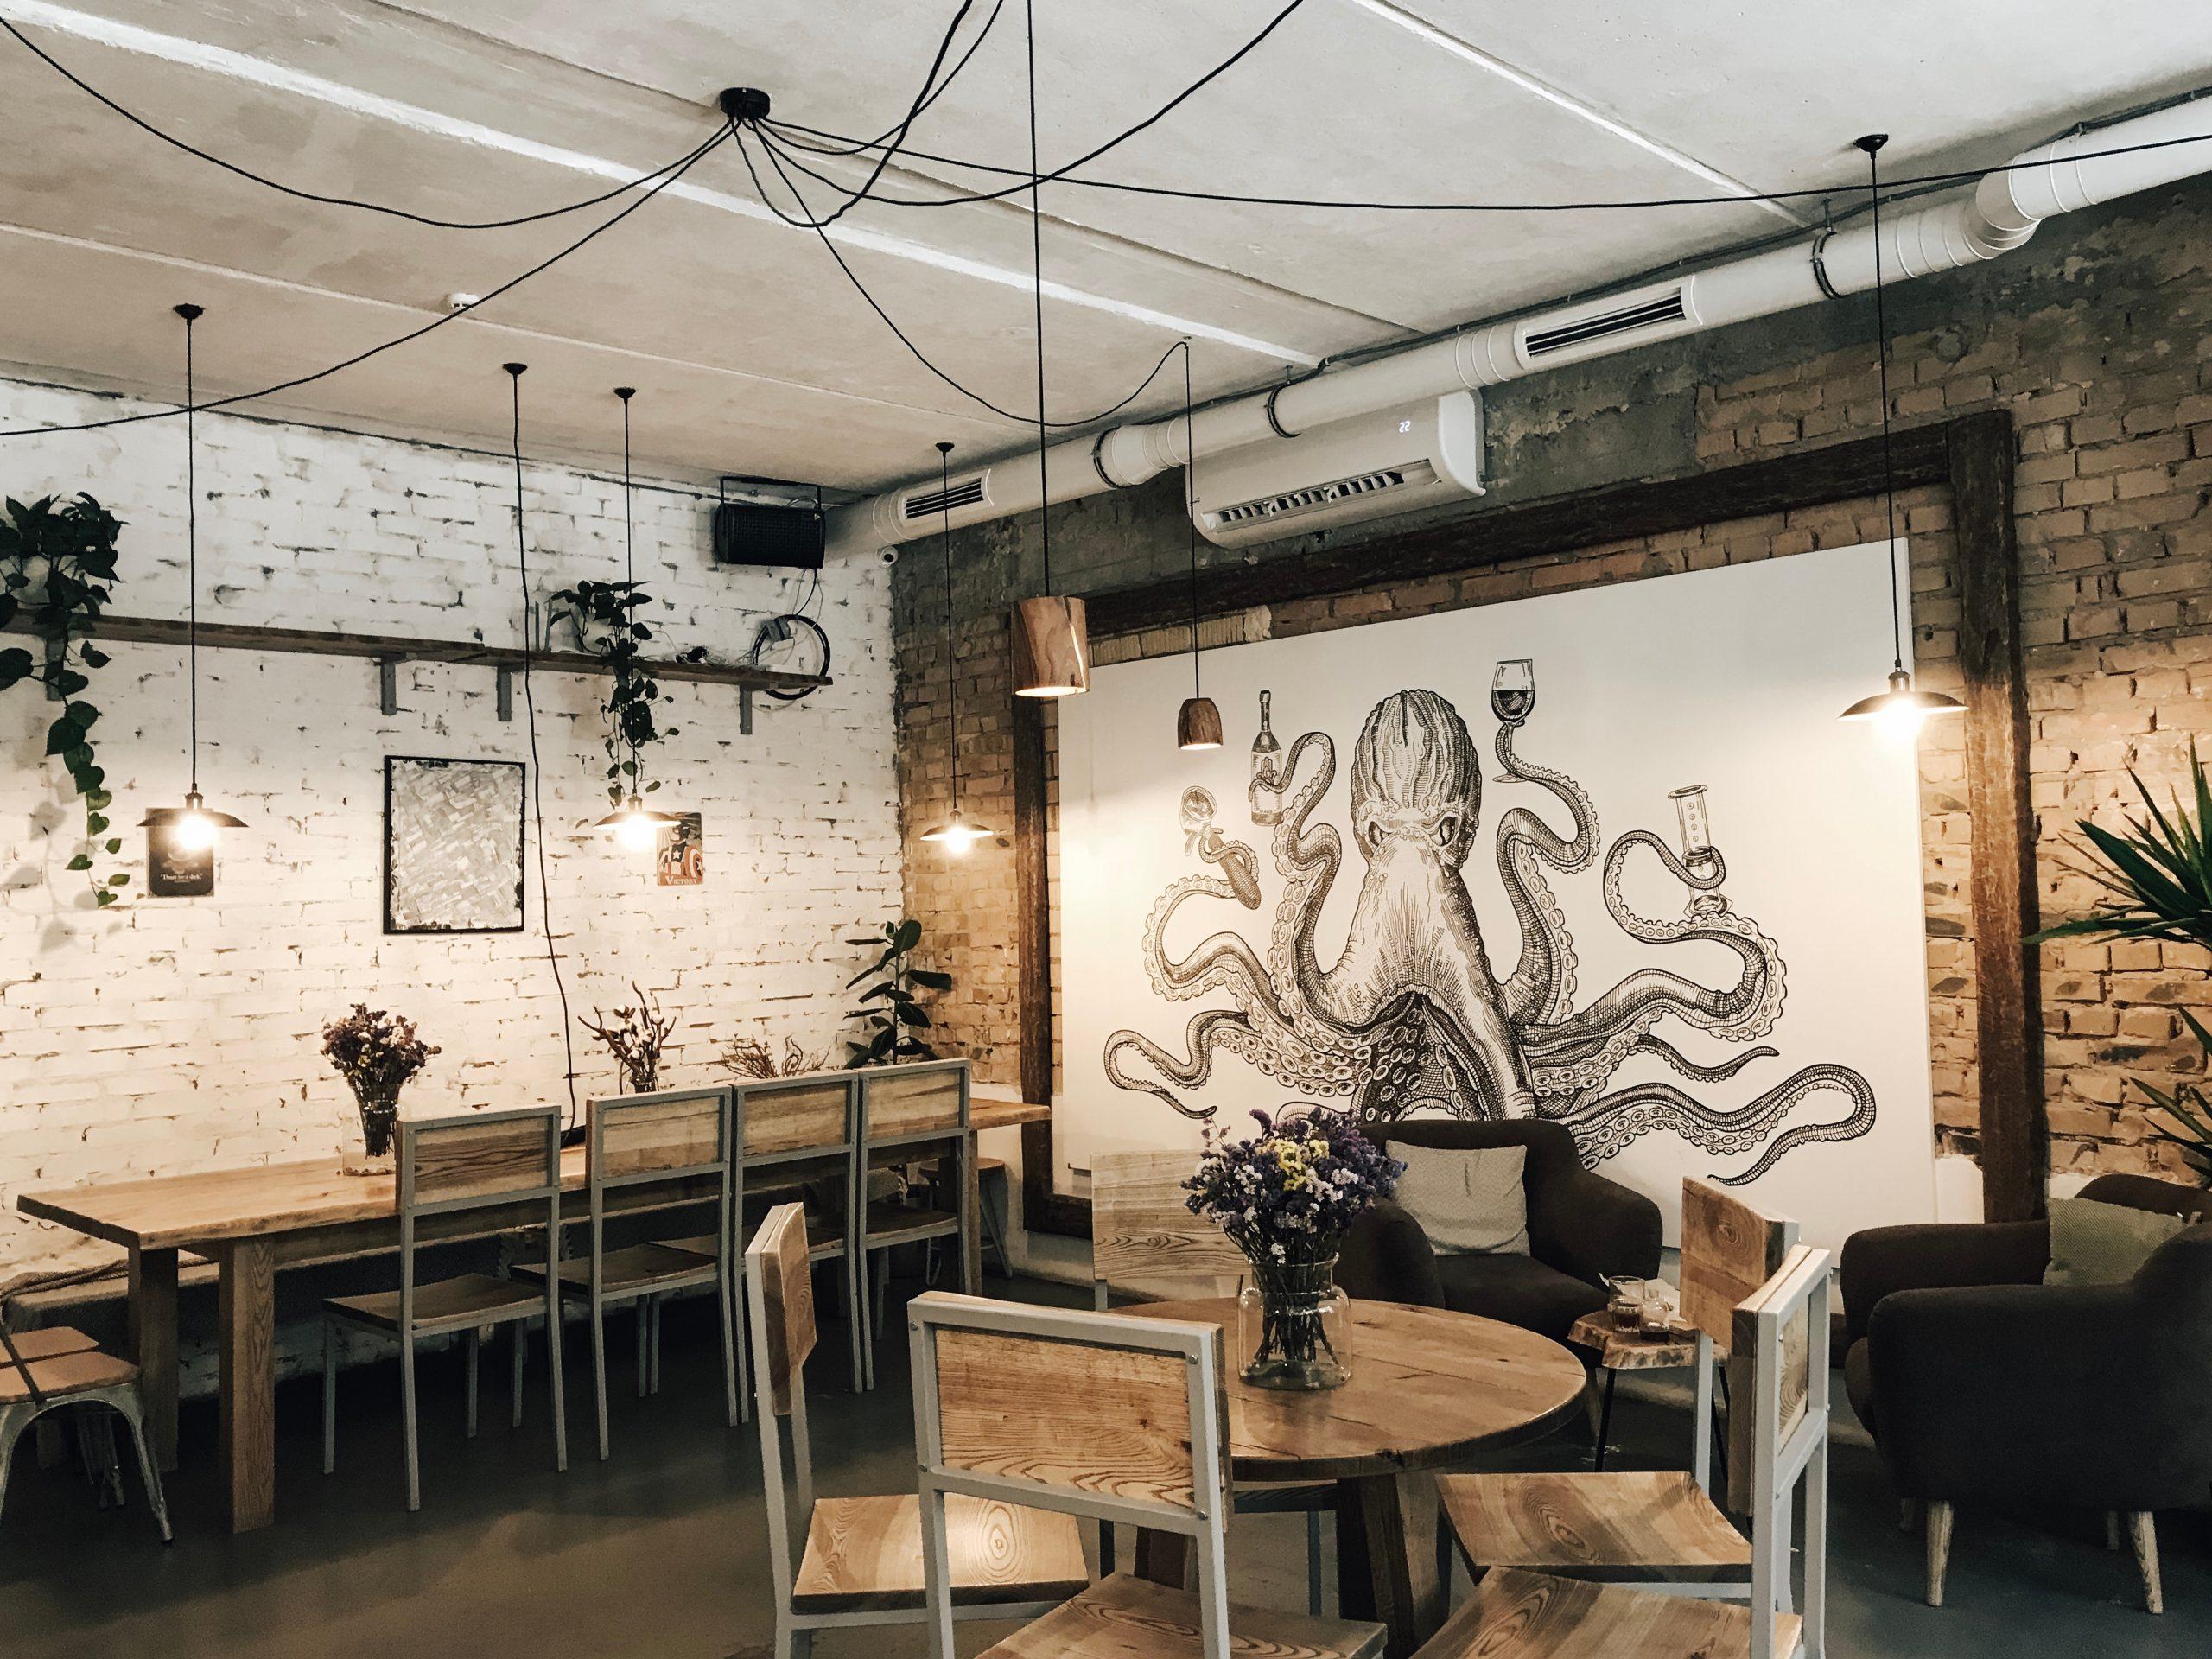 Restaurant avec une grosse peinture de pieuvre